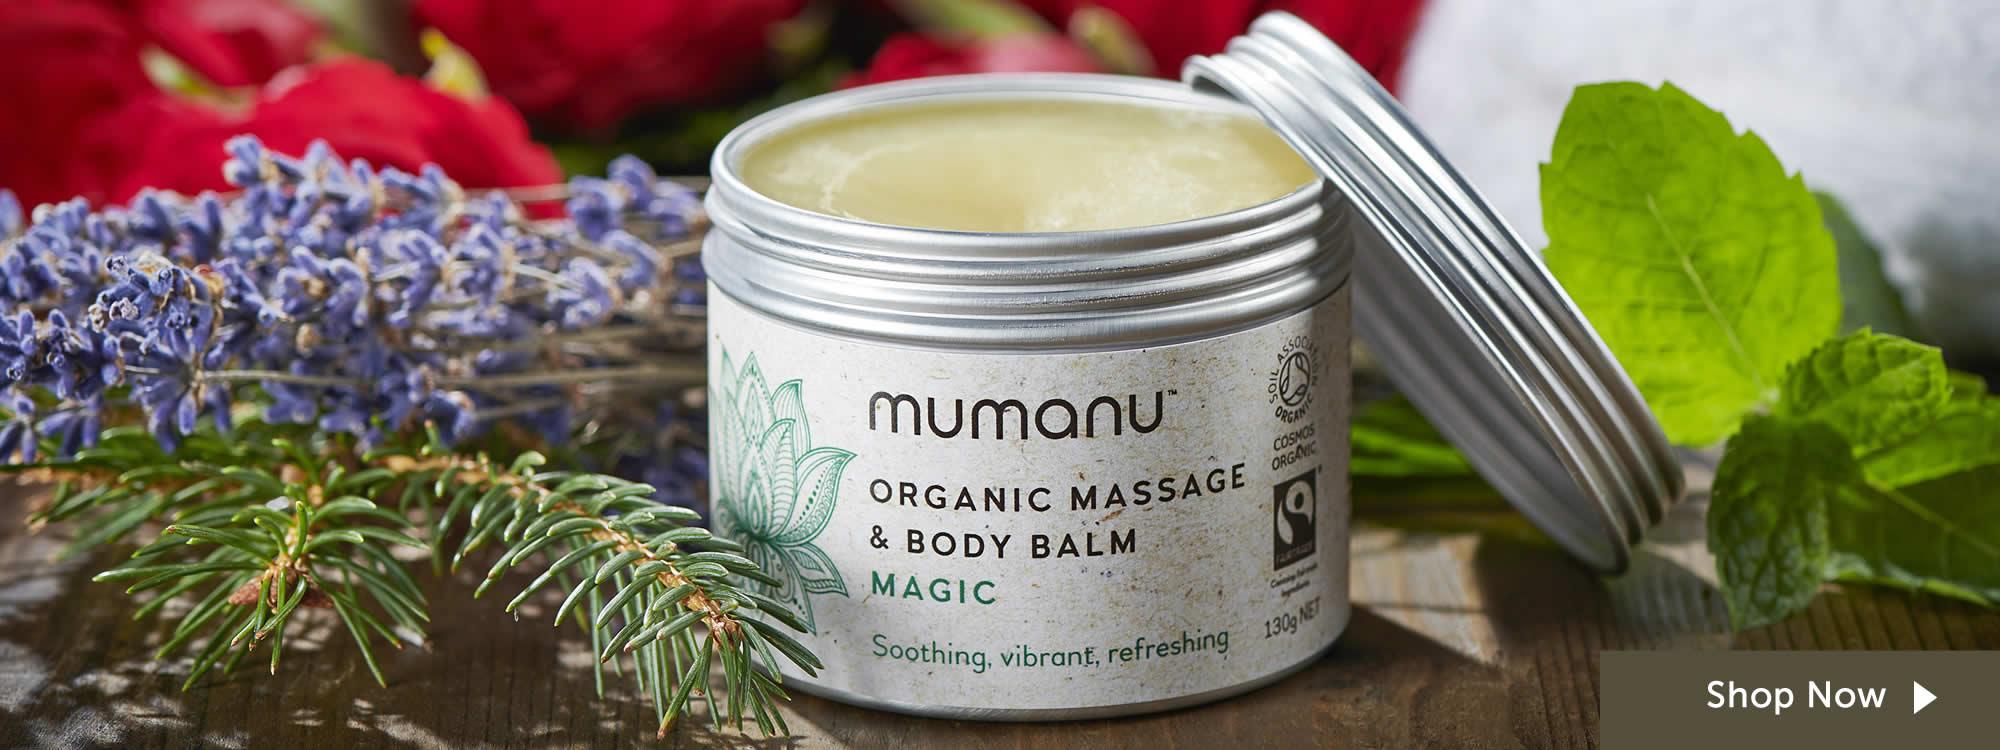 Mumanu Organic Massage Oil & Body Balm Aromatherapy Blend - Shea Moisturiser & Ethcial Skin Care - With Fairtrade Ingredients